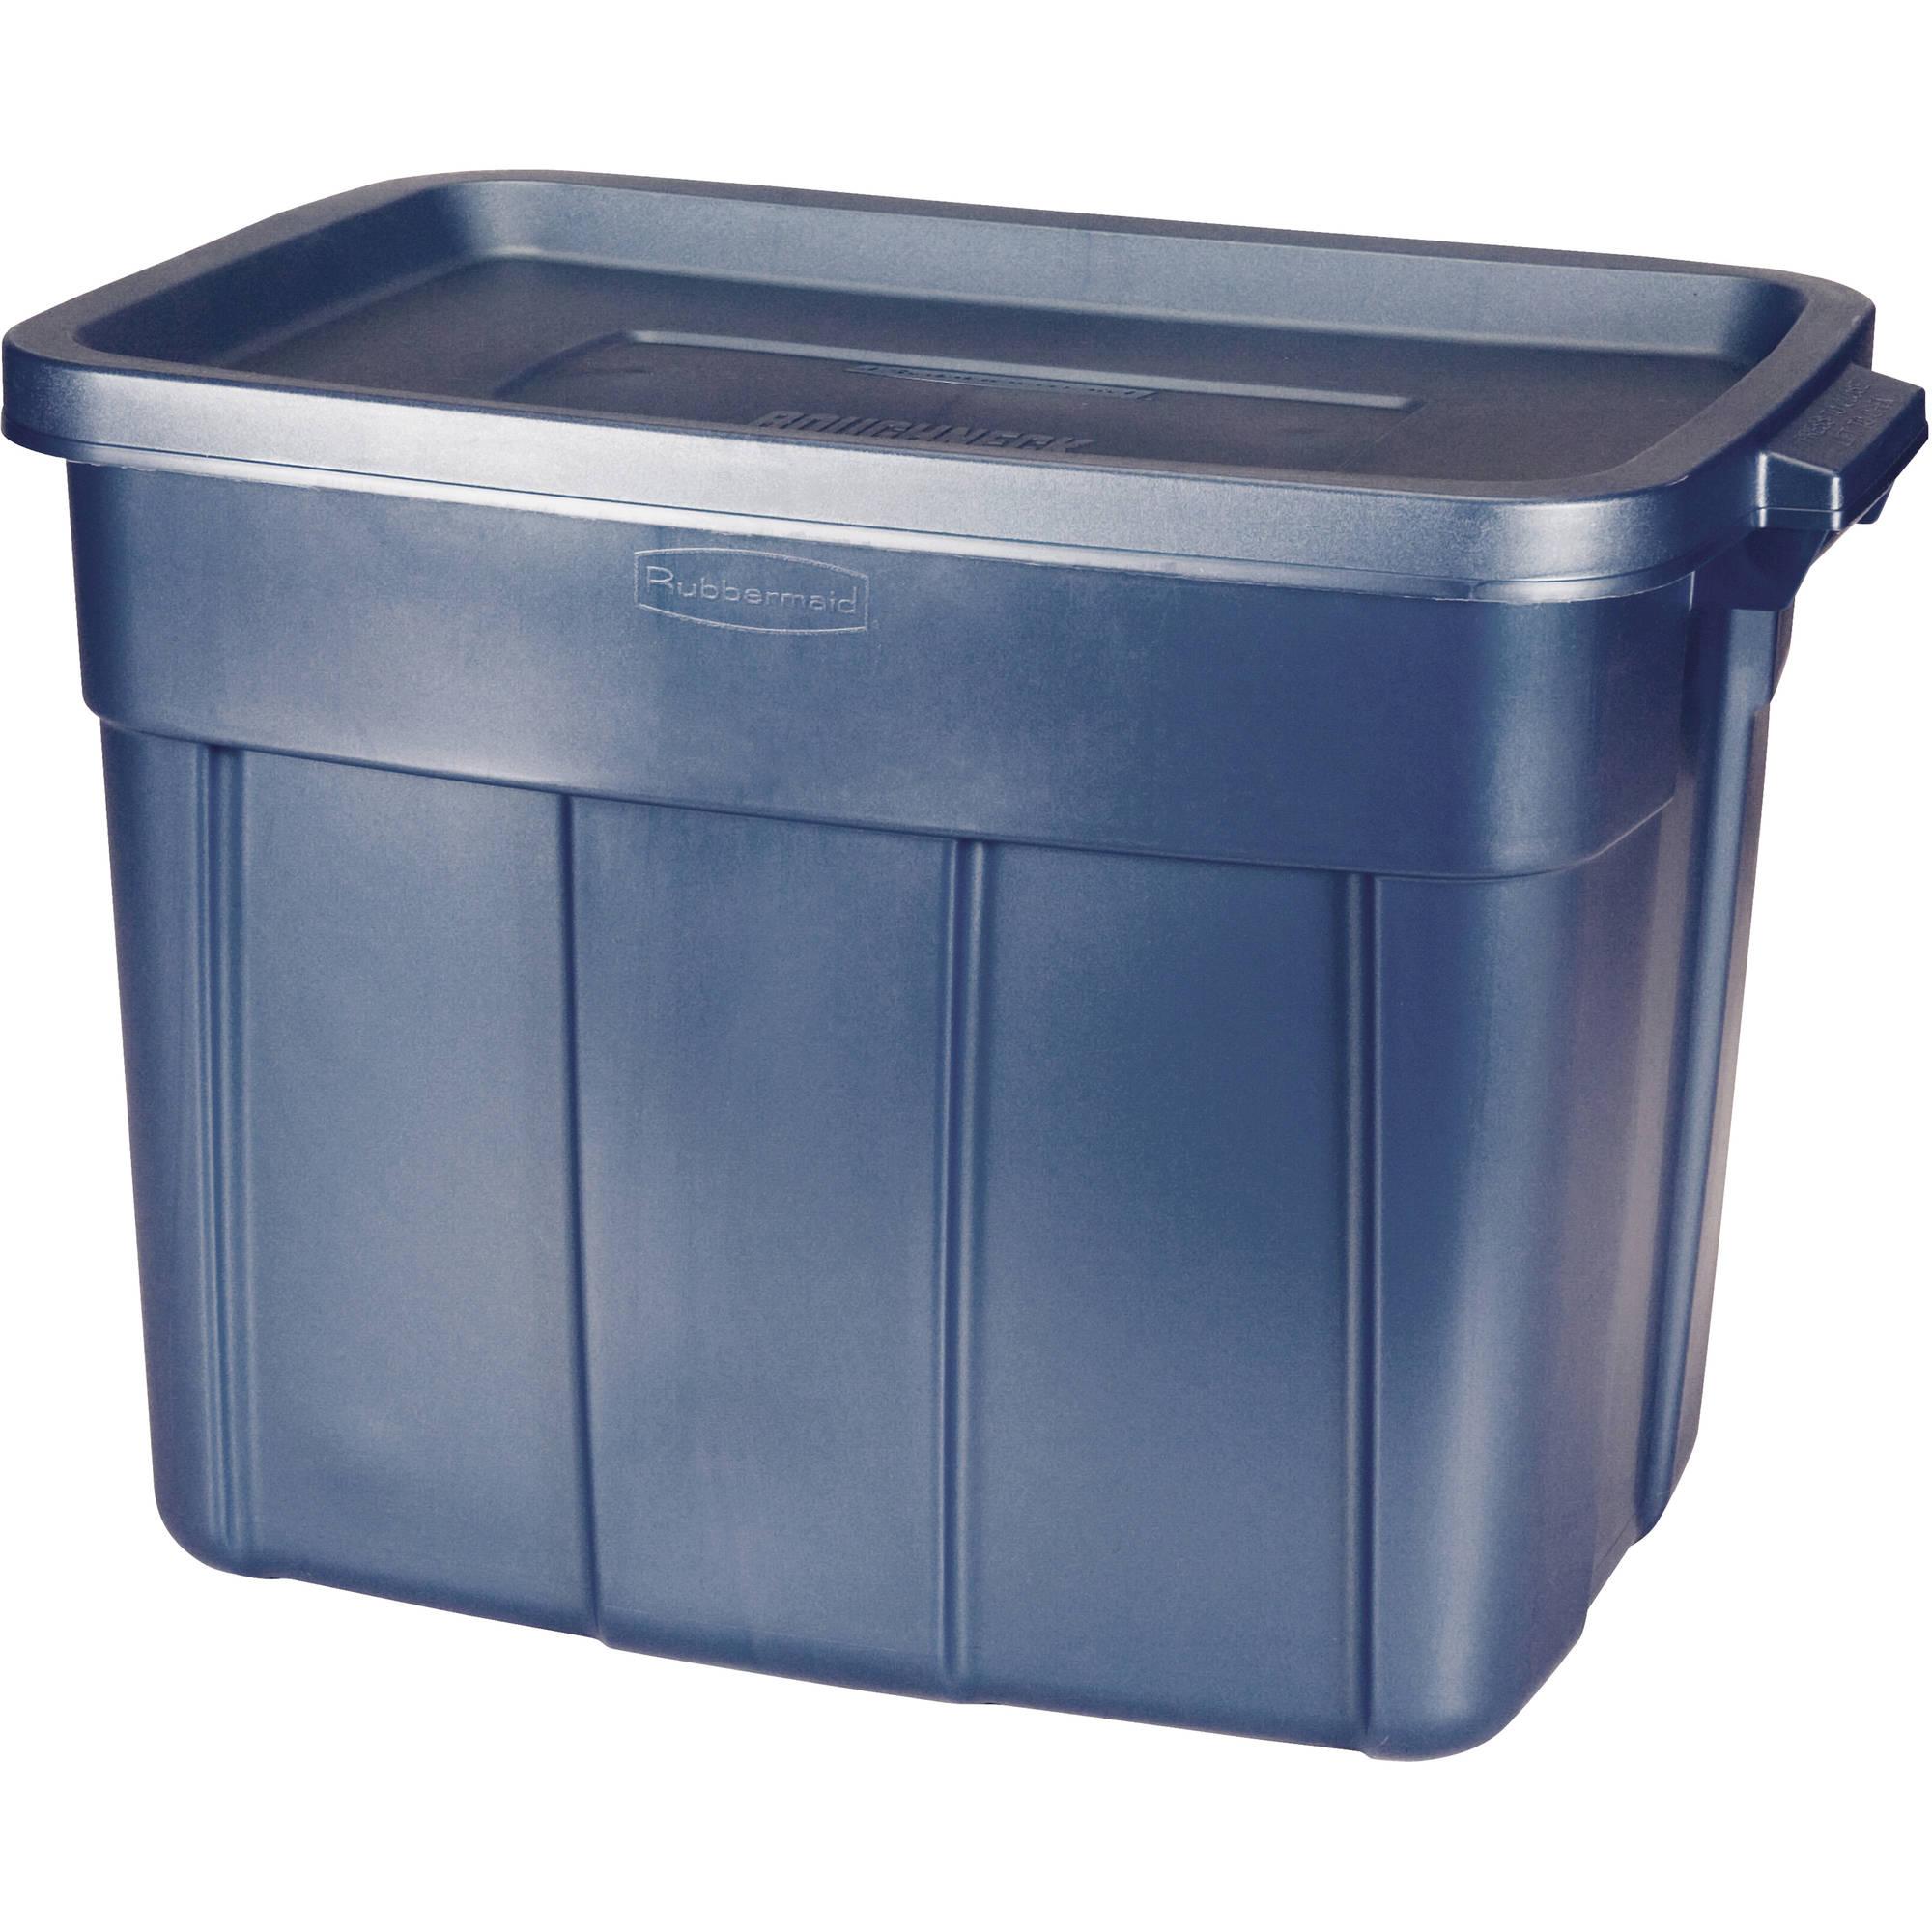 Rubbermaid Roughneck 18 Gal. Storage Box, Dark Indigo Metallic (Set of 12)